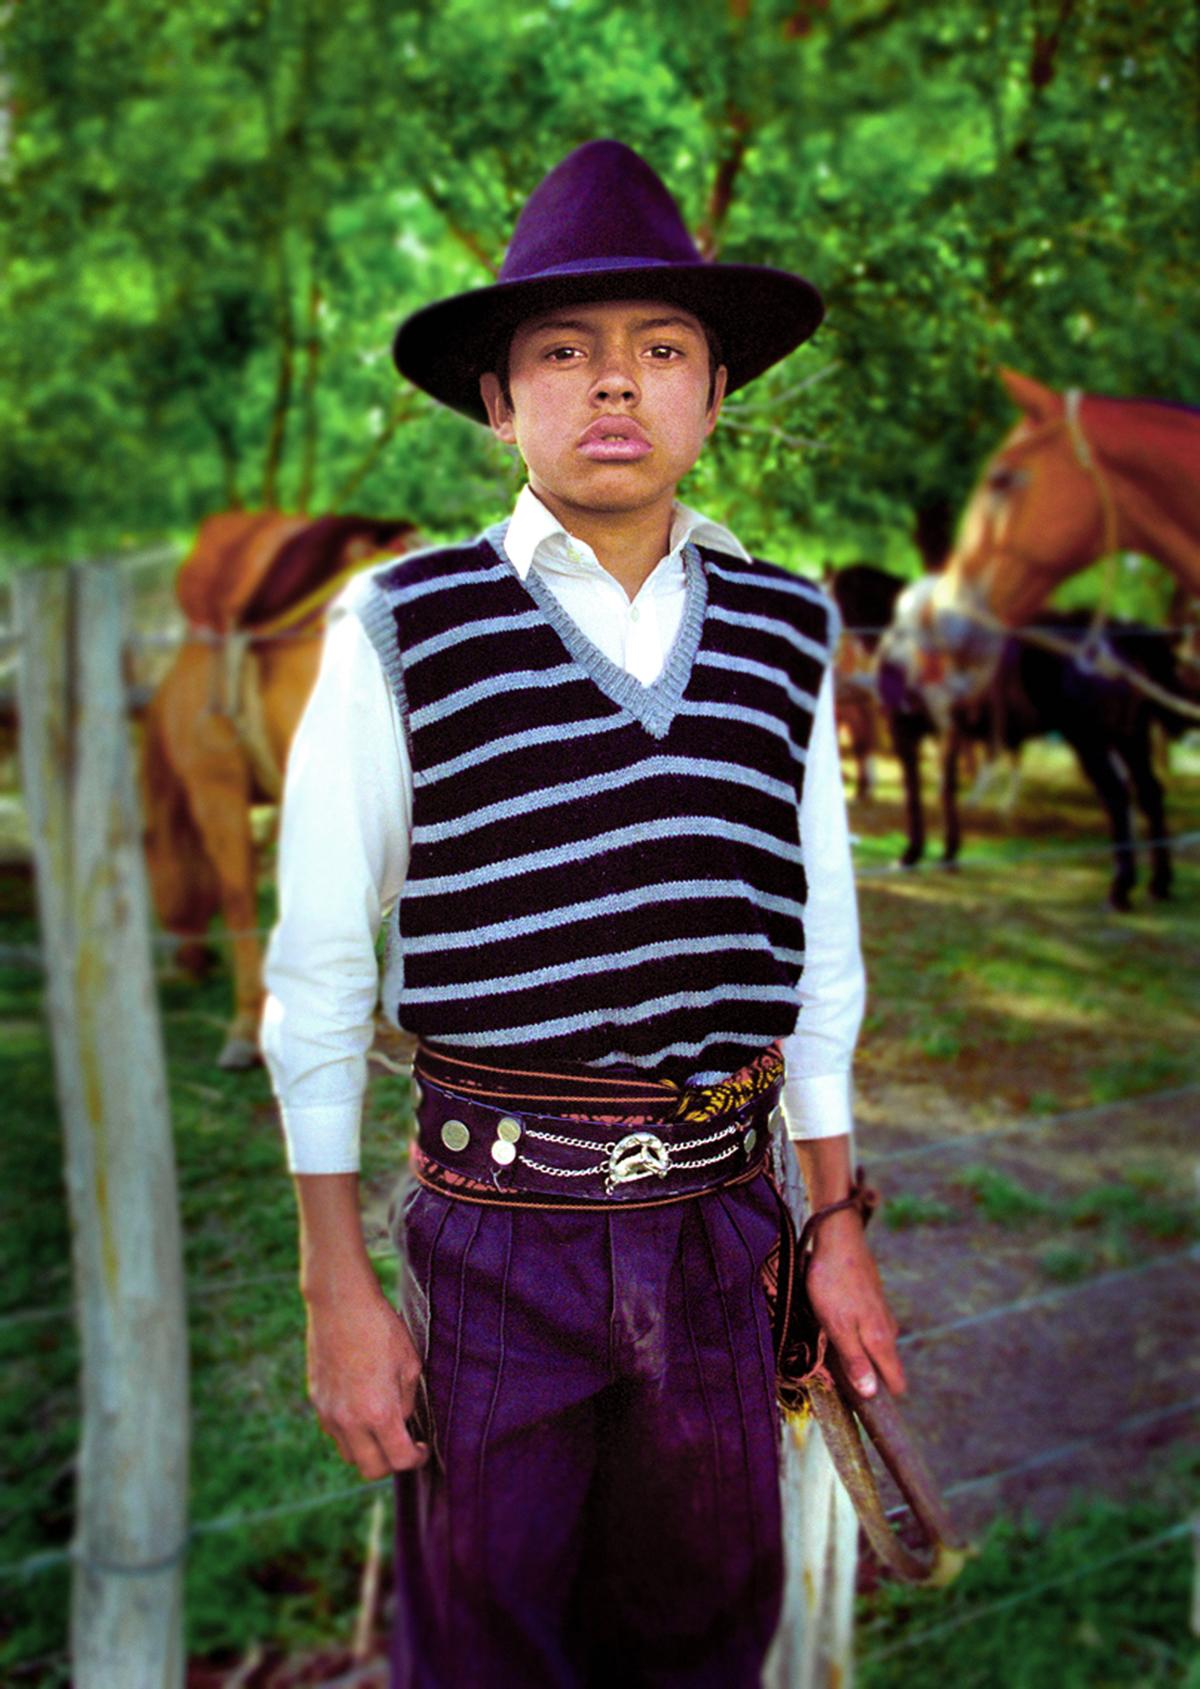 Young gaucho